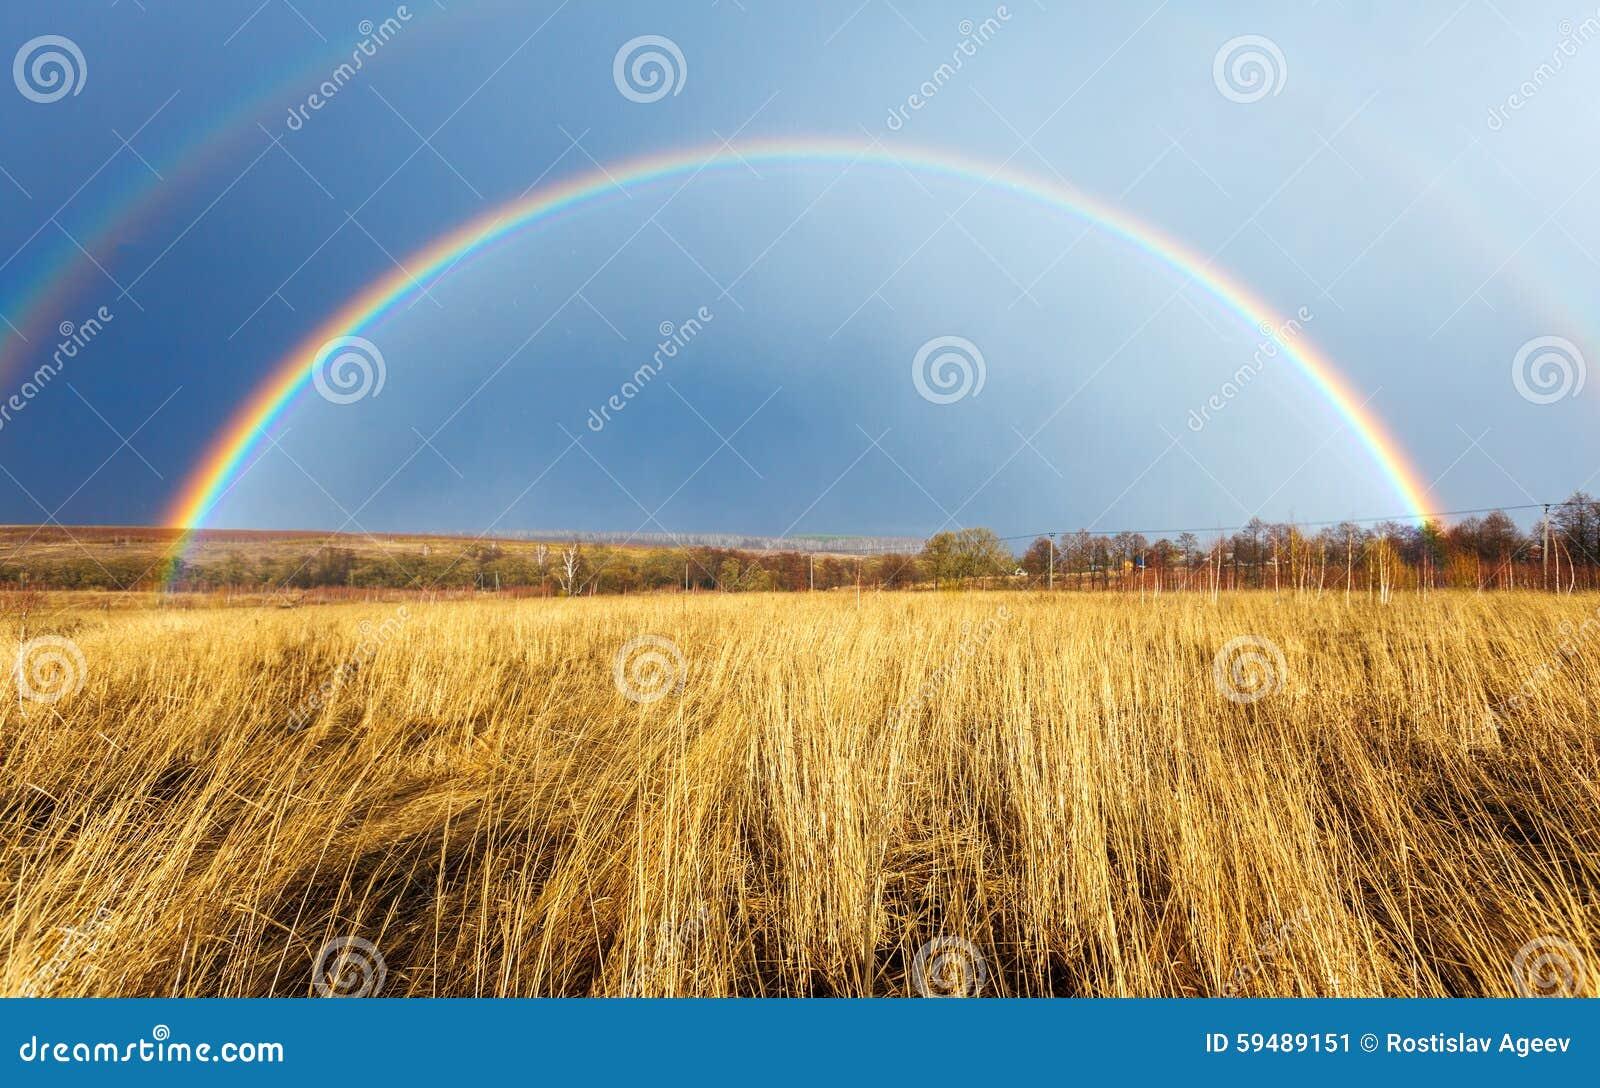 Schöner voller Regenbogen über Bauernhof-Feld am Frühling